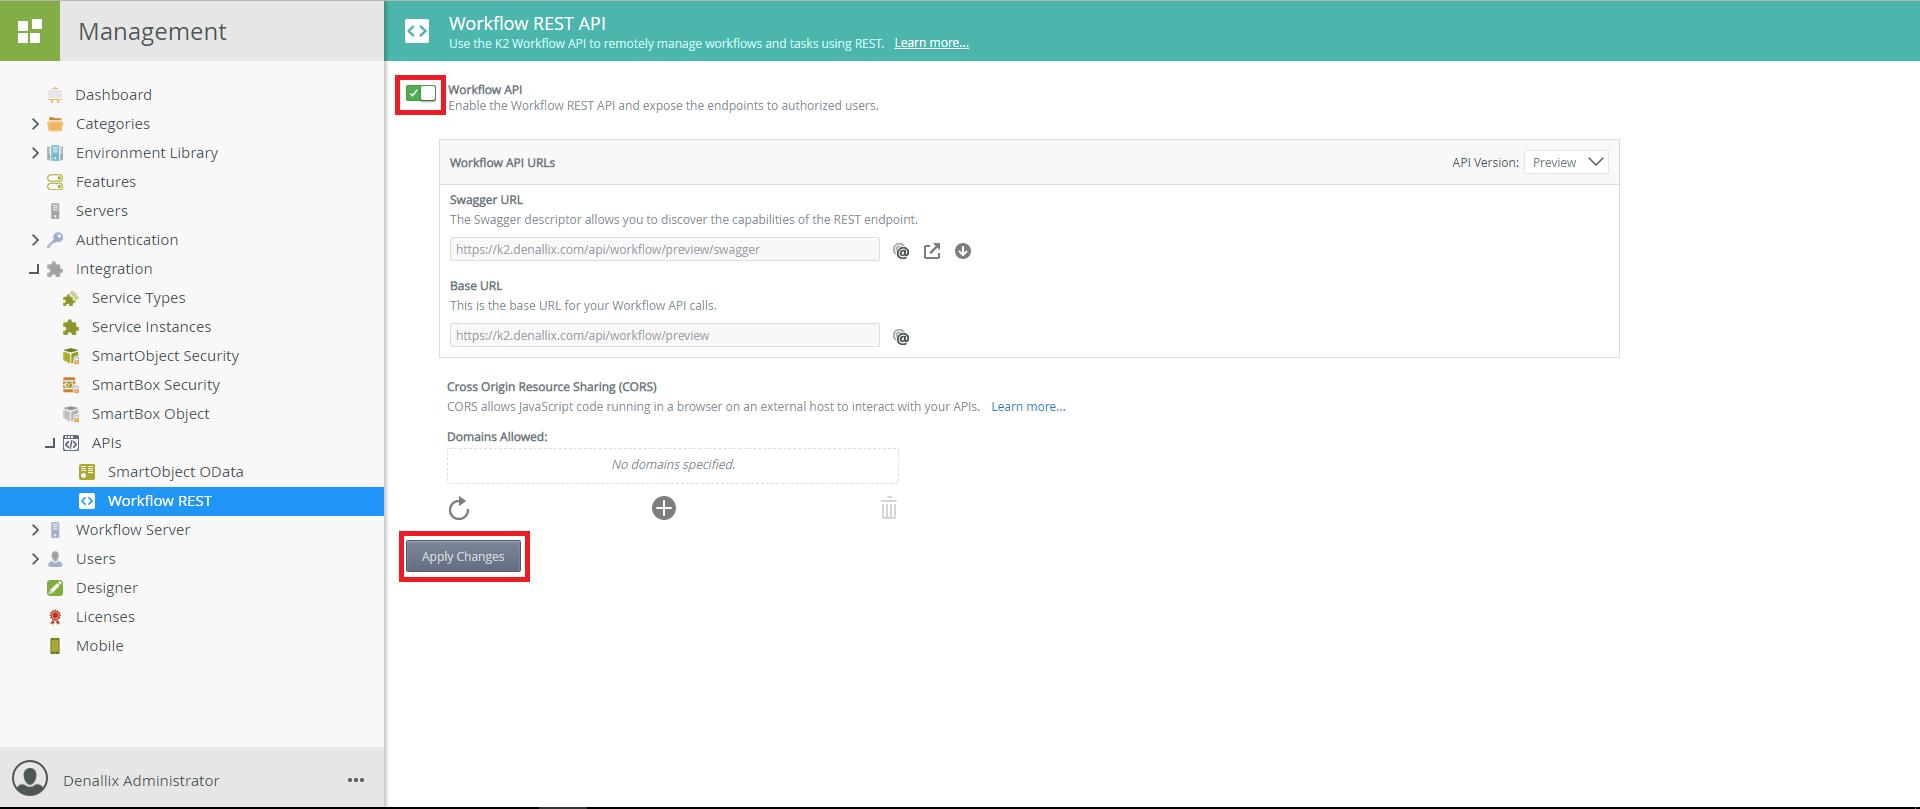 API K2 - Apply Changes